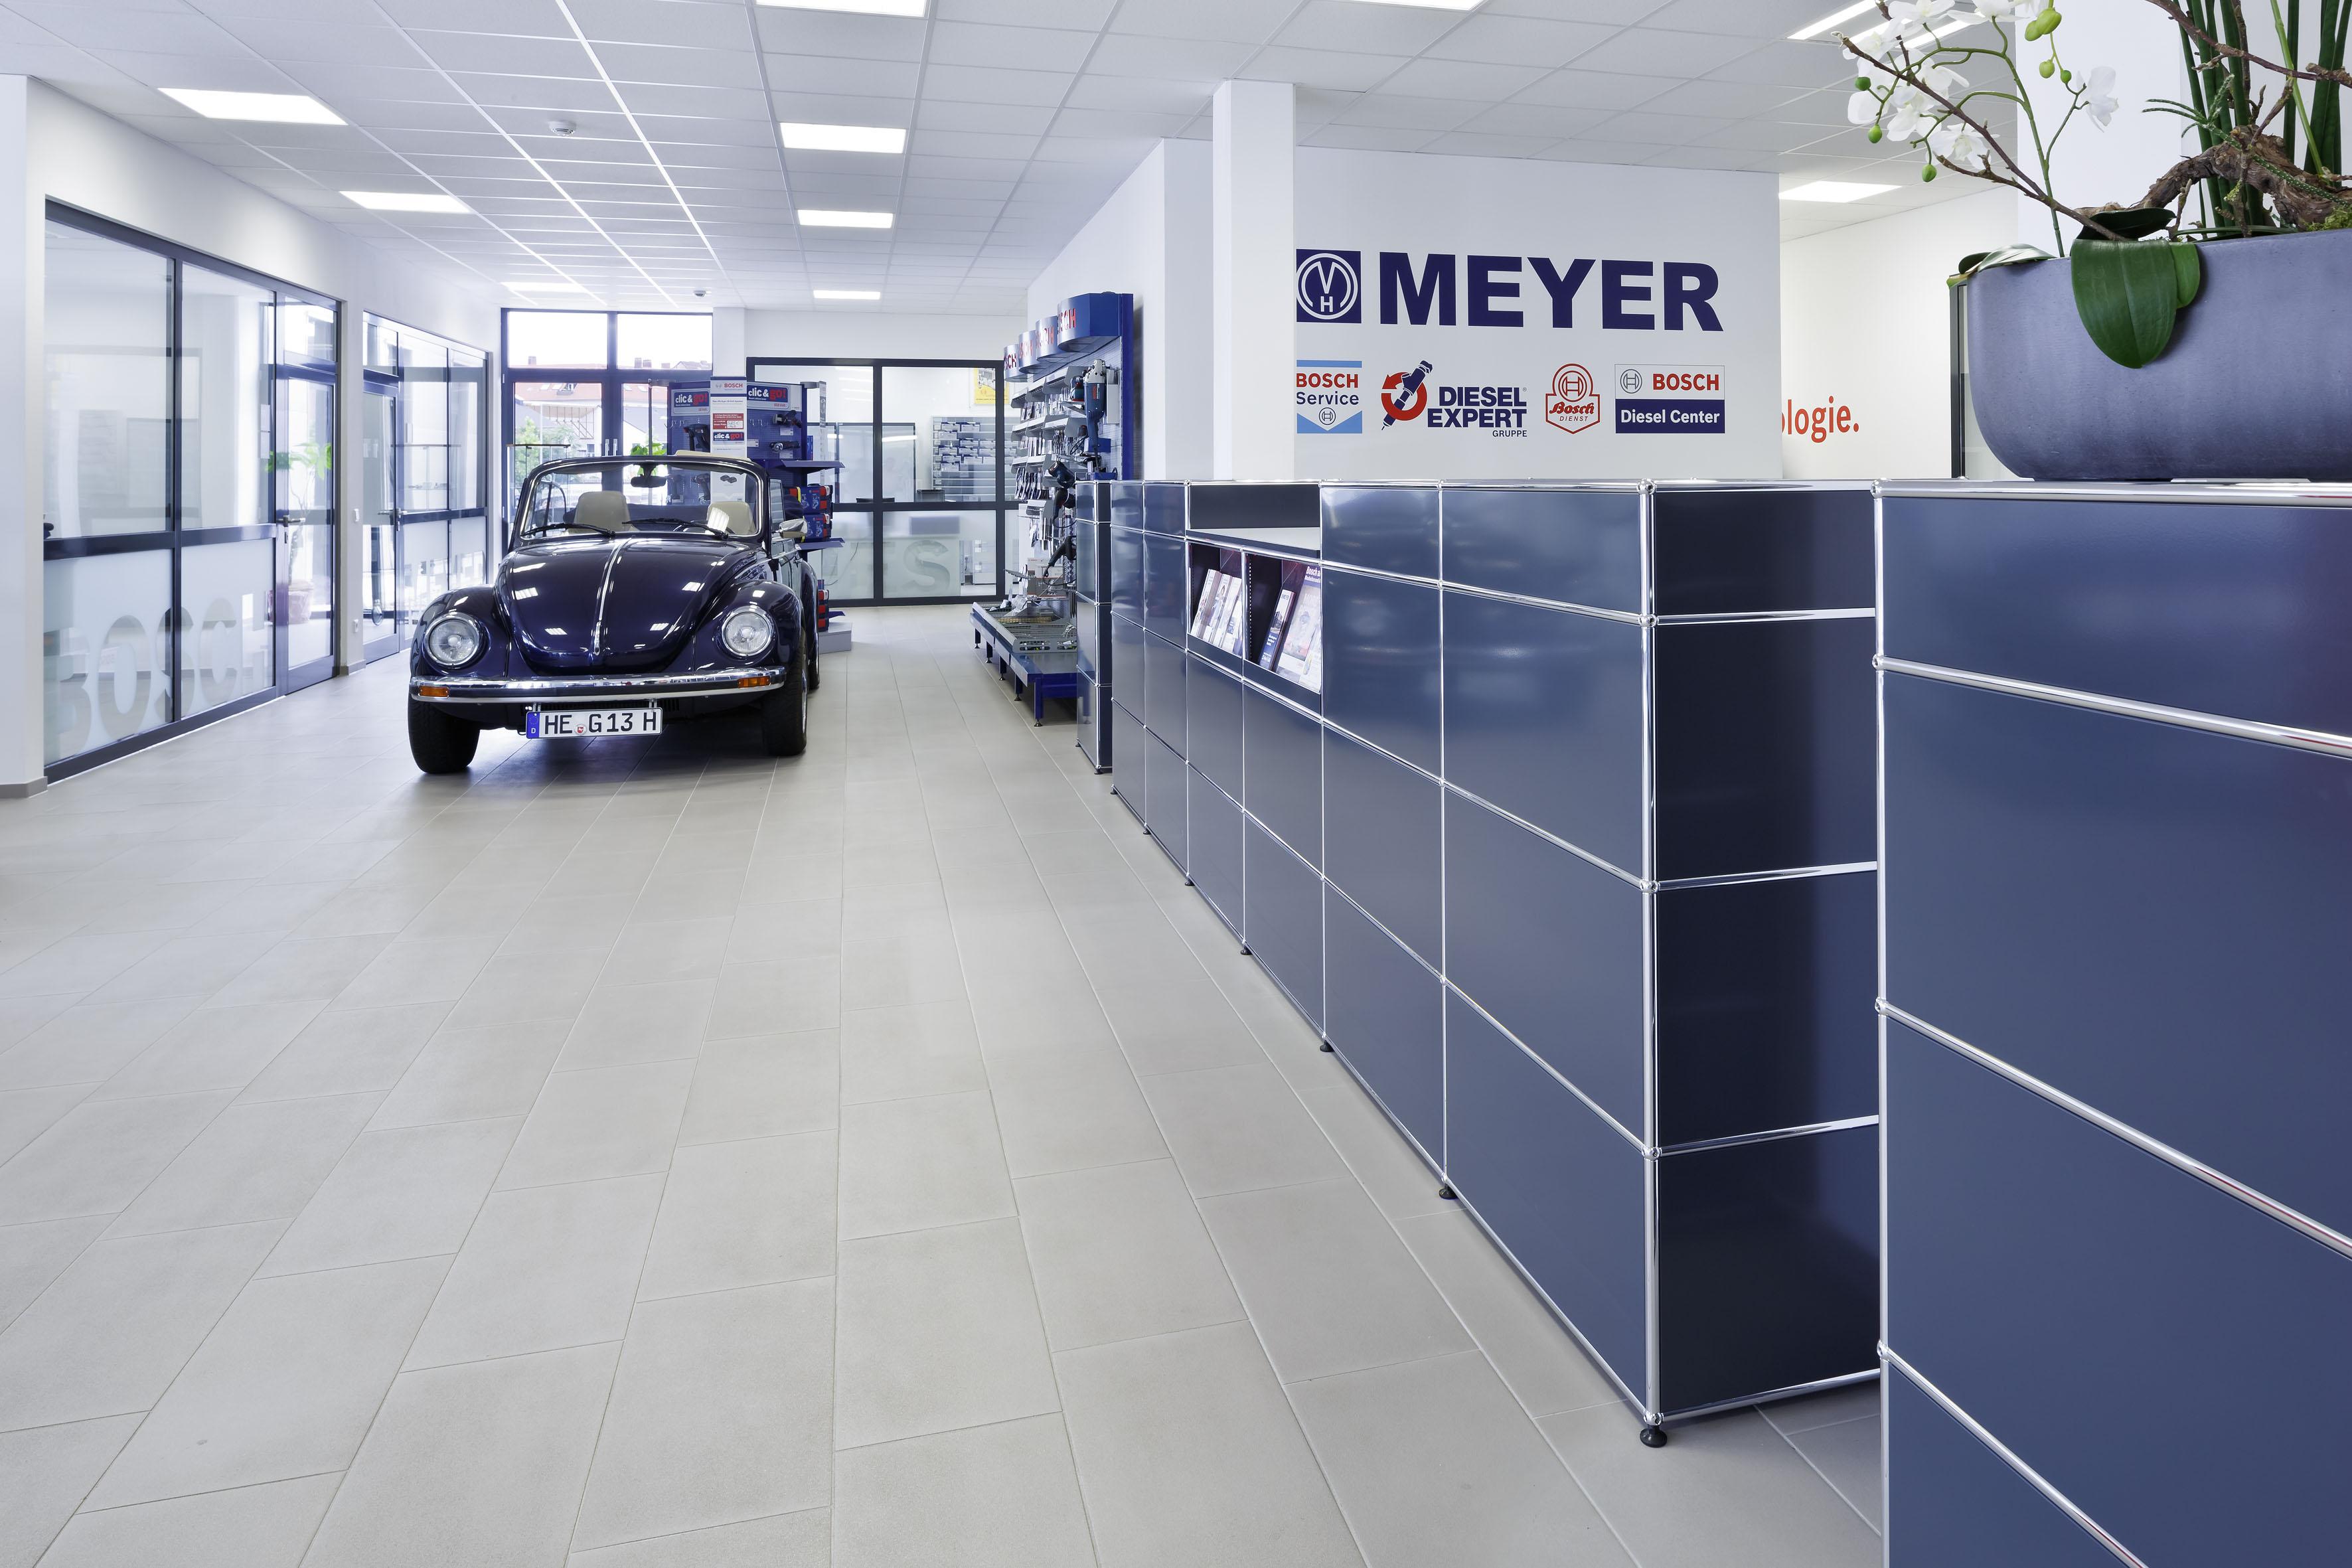 Bosch Service Meyer Hannover